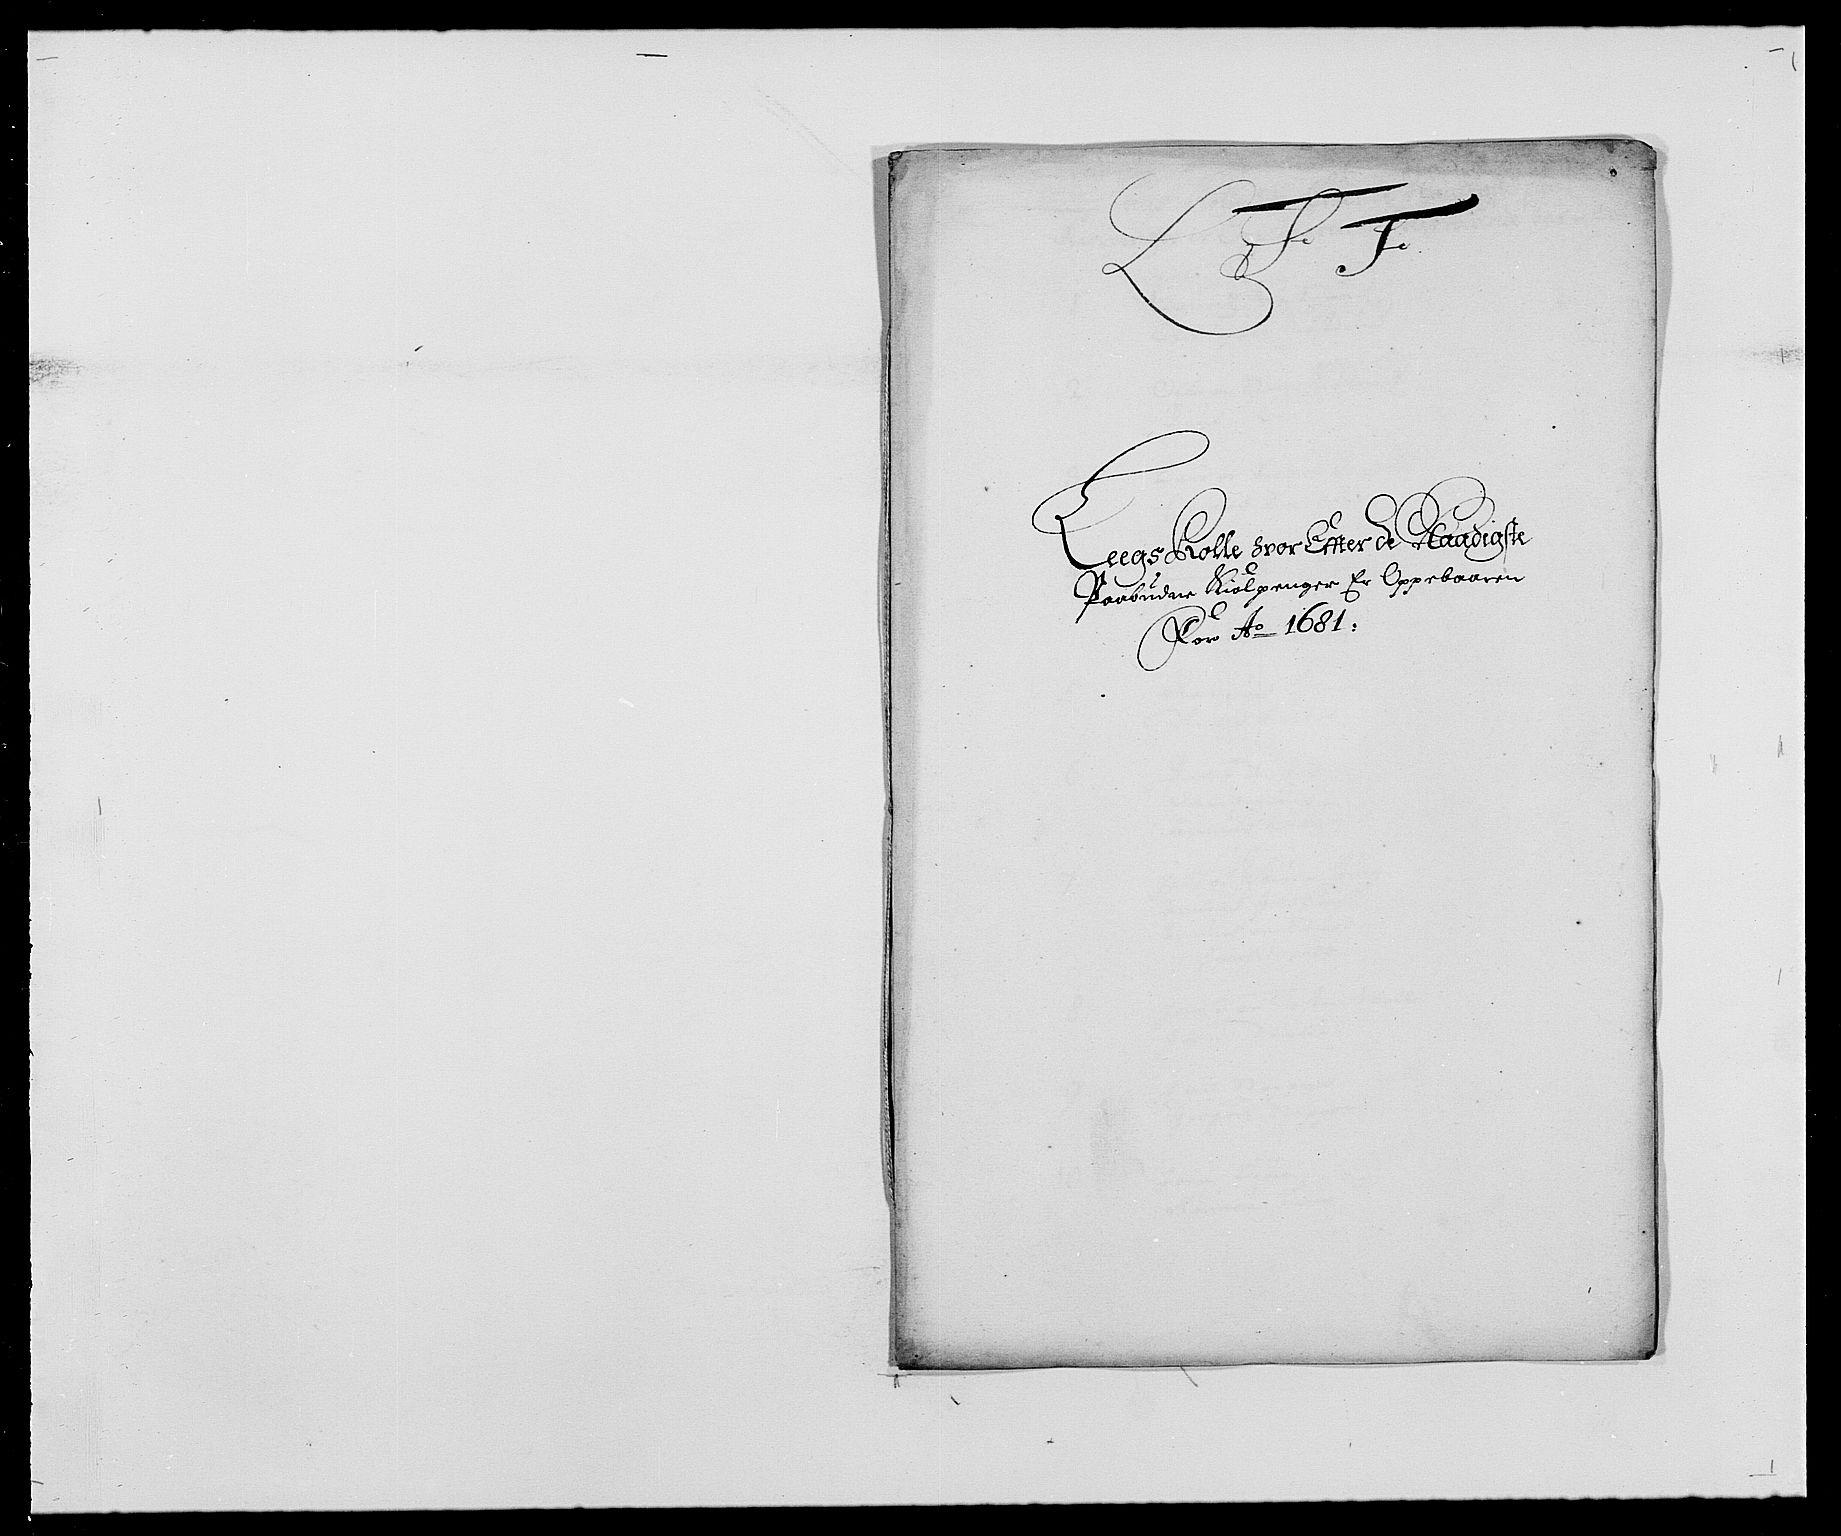 RA, Rentekammeret inntil 1814, Reviderte regnskaper, Fogderegnskap, R27/L1686: Fogderegnskap Lier, 1678-1686, s. 352